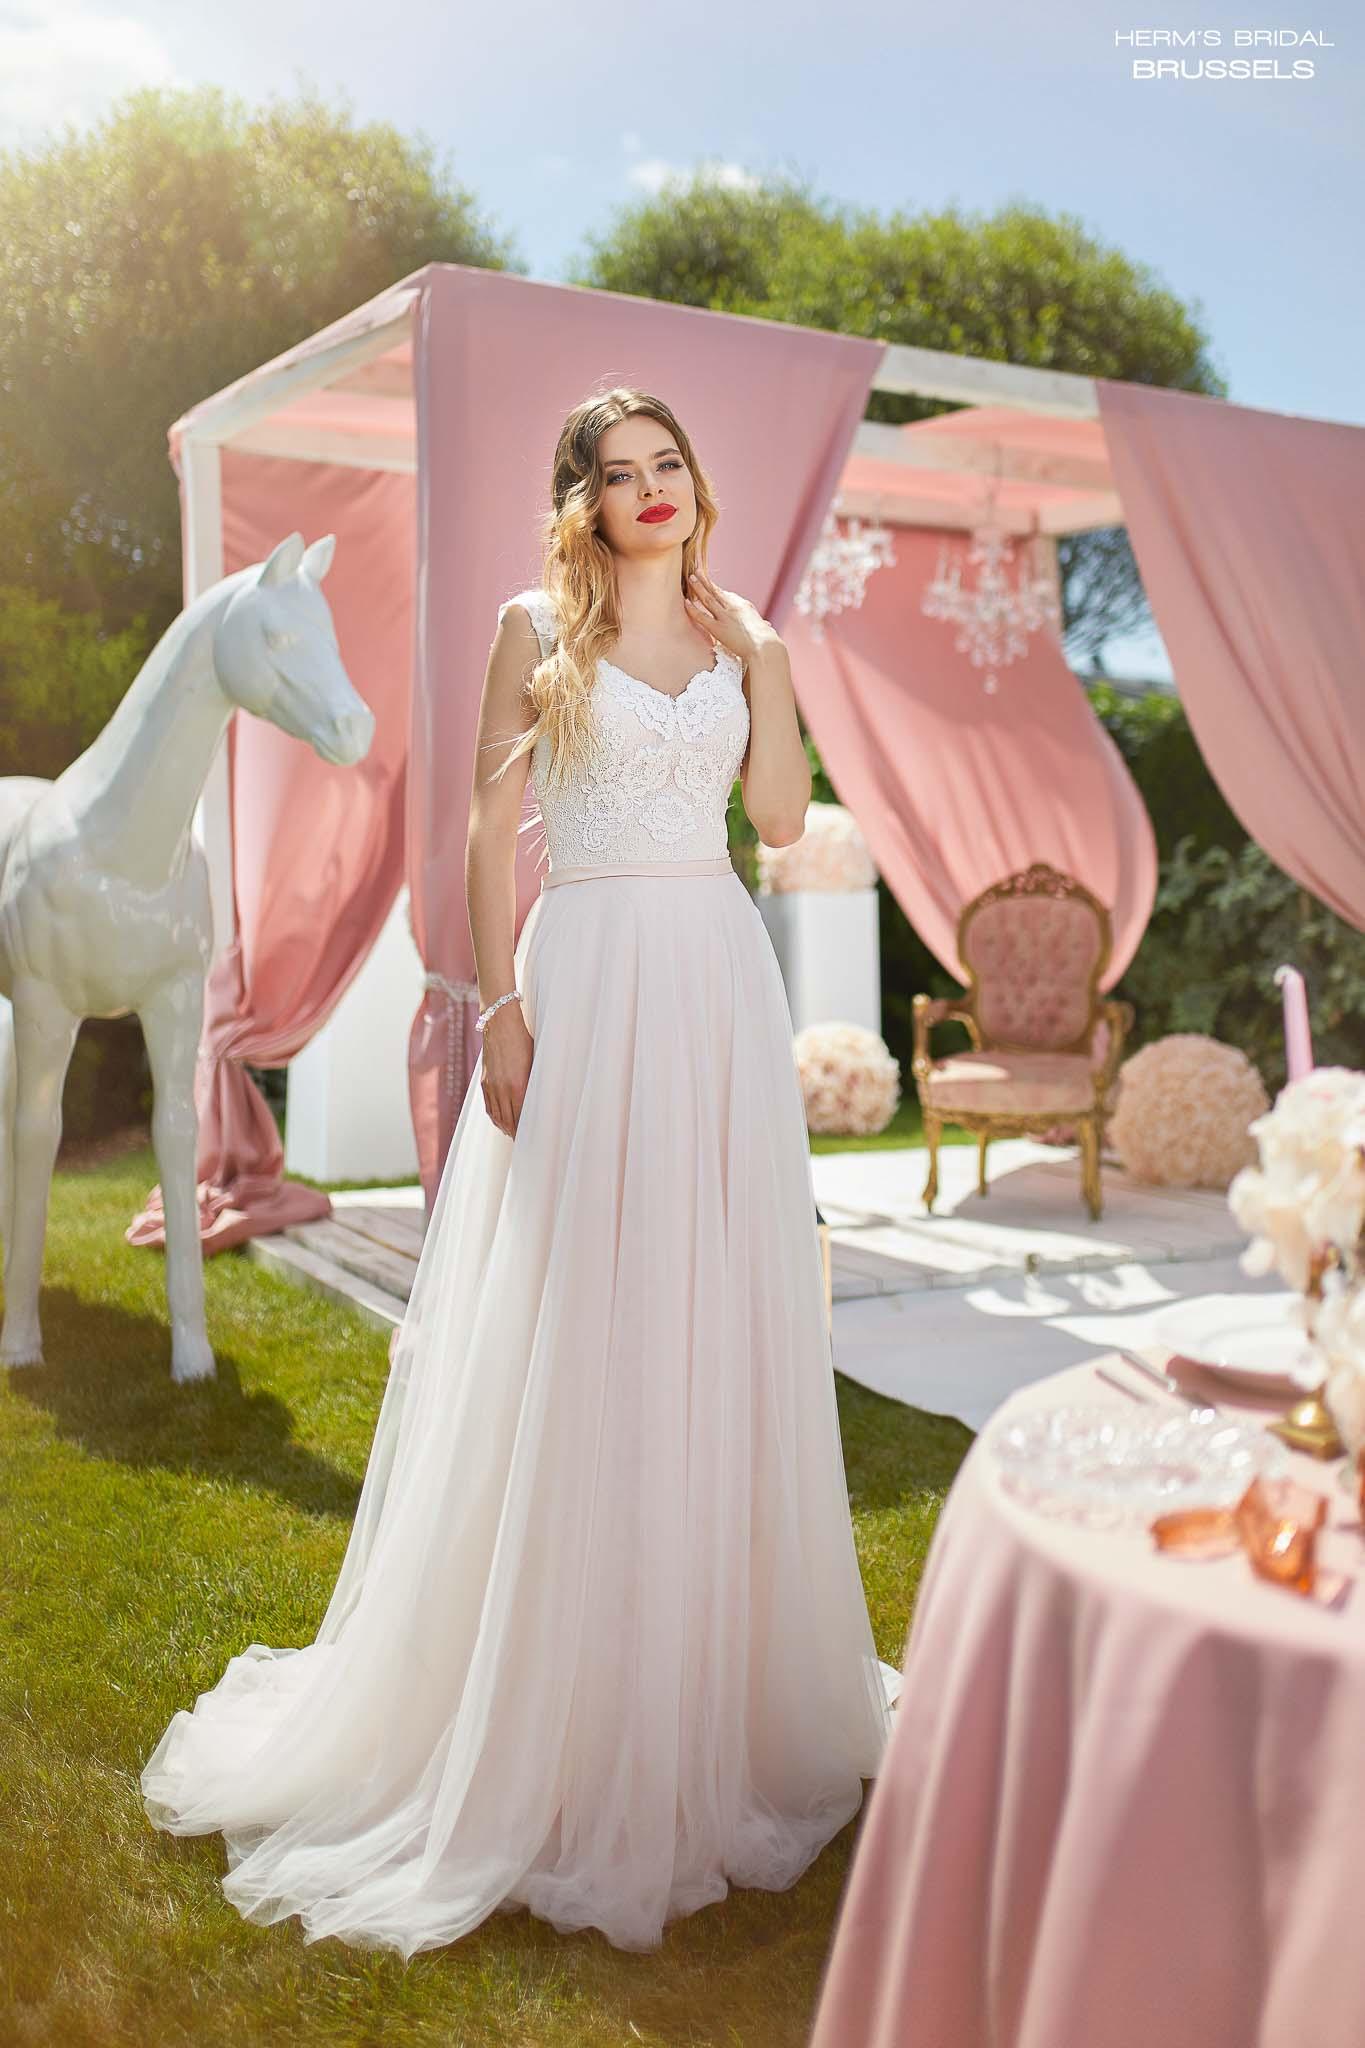 wedding dress Herm's Bridal Brussels